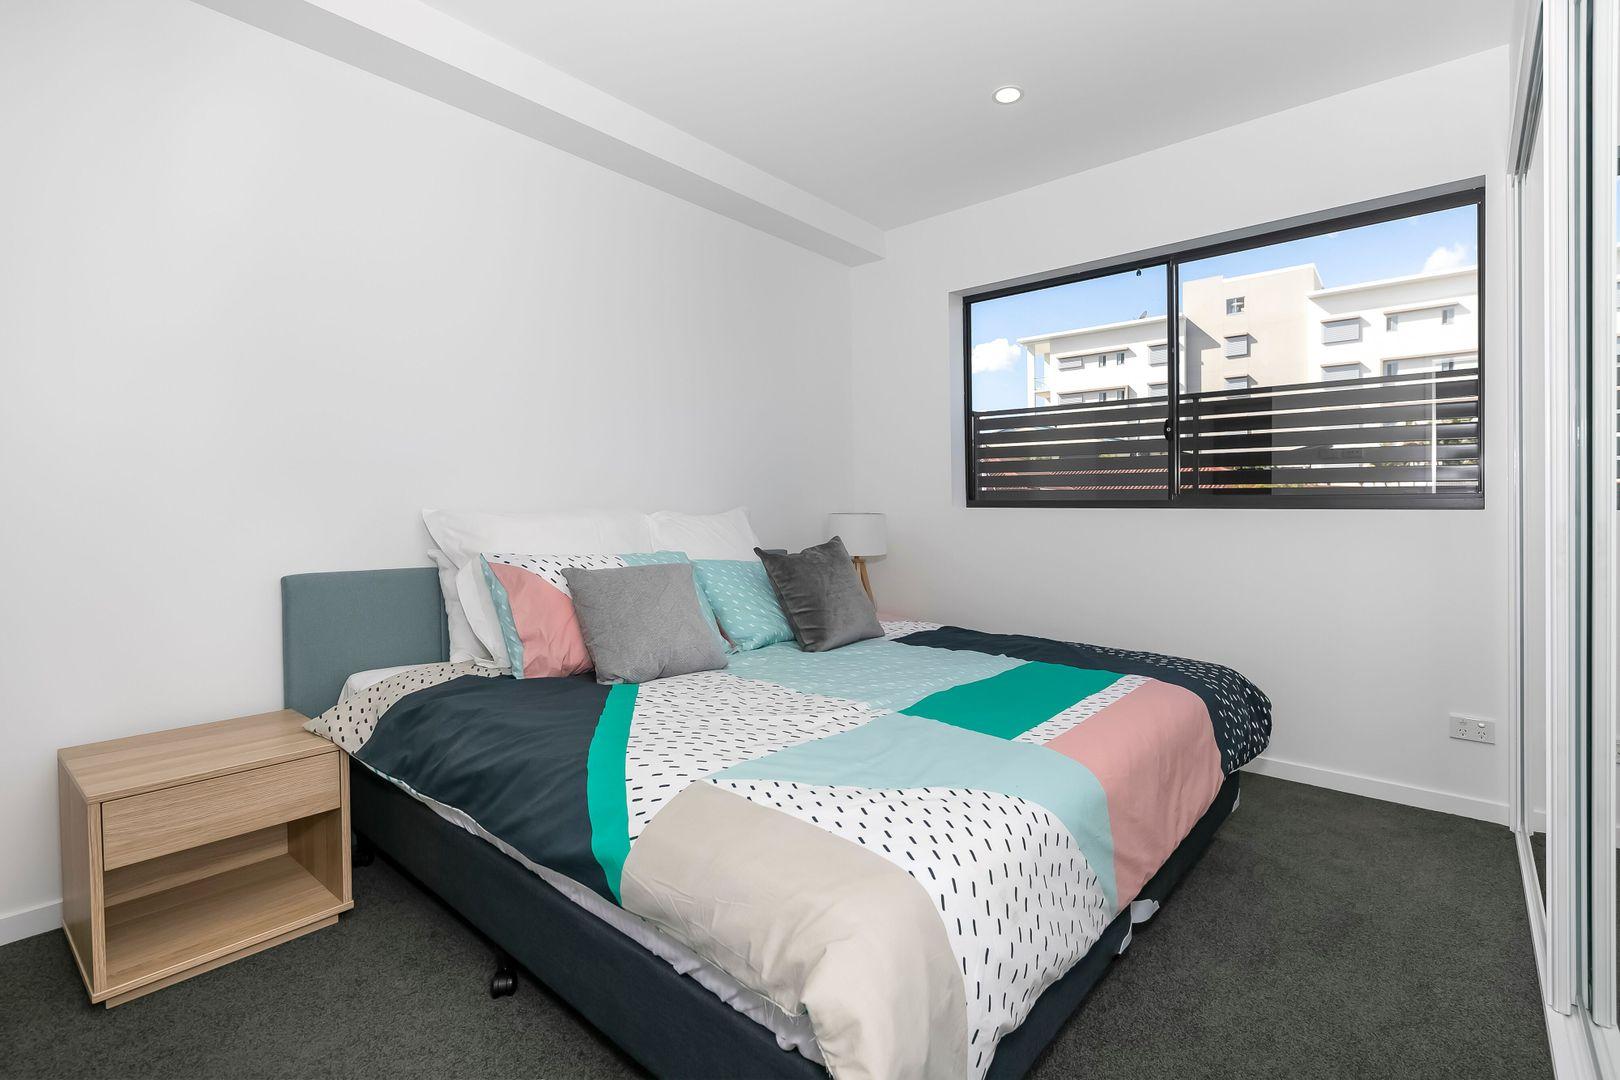 19/27 Lumley Street, Upper Mount Gravatt QLD 4122, Image 2